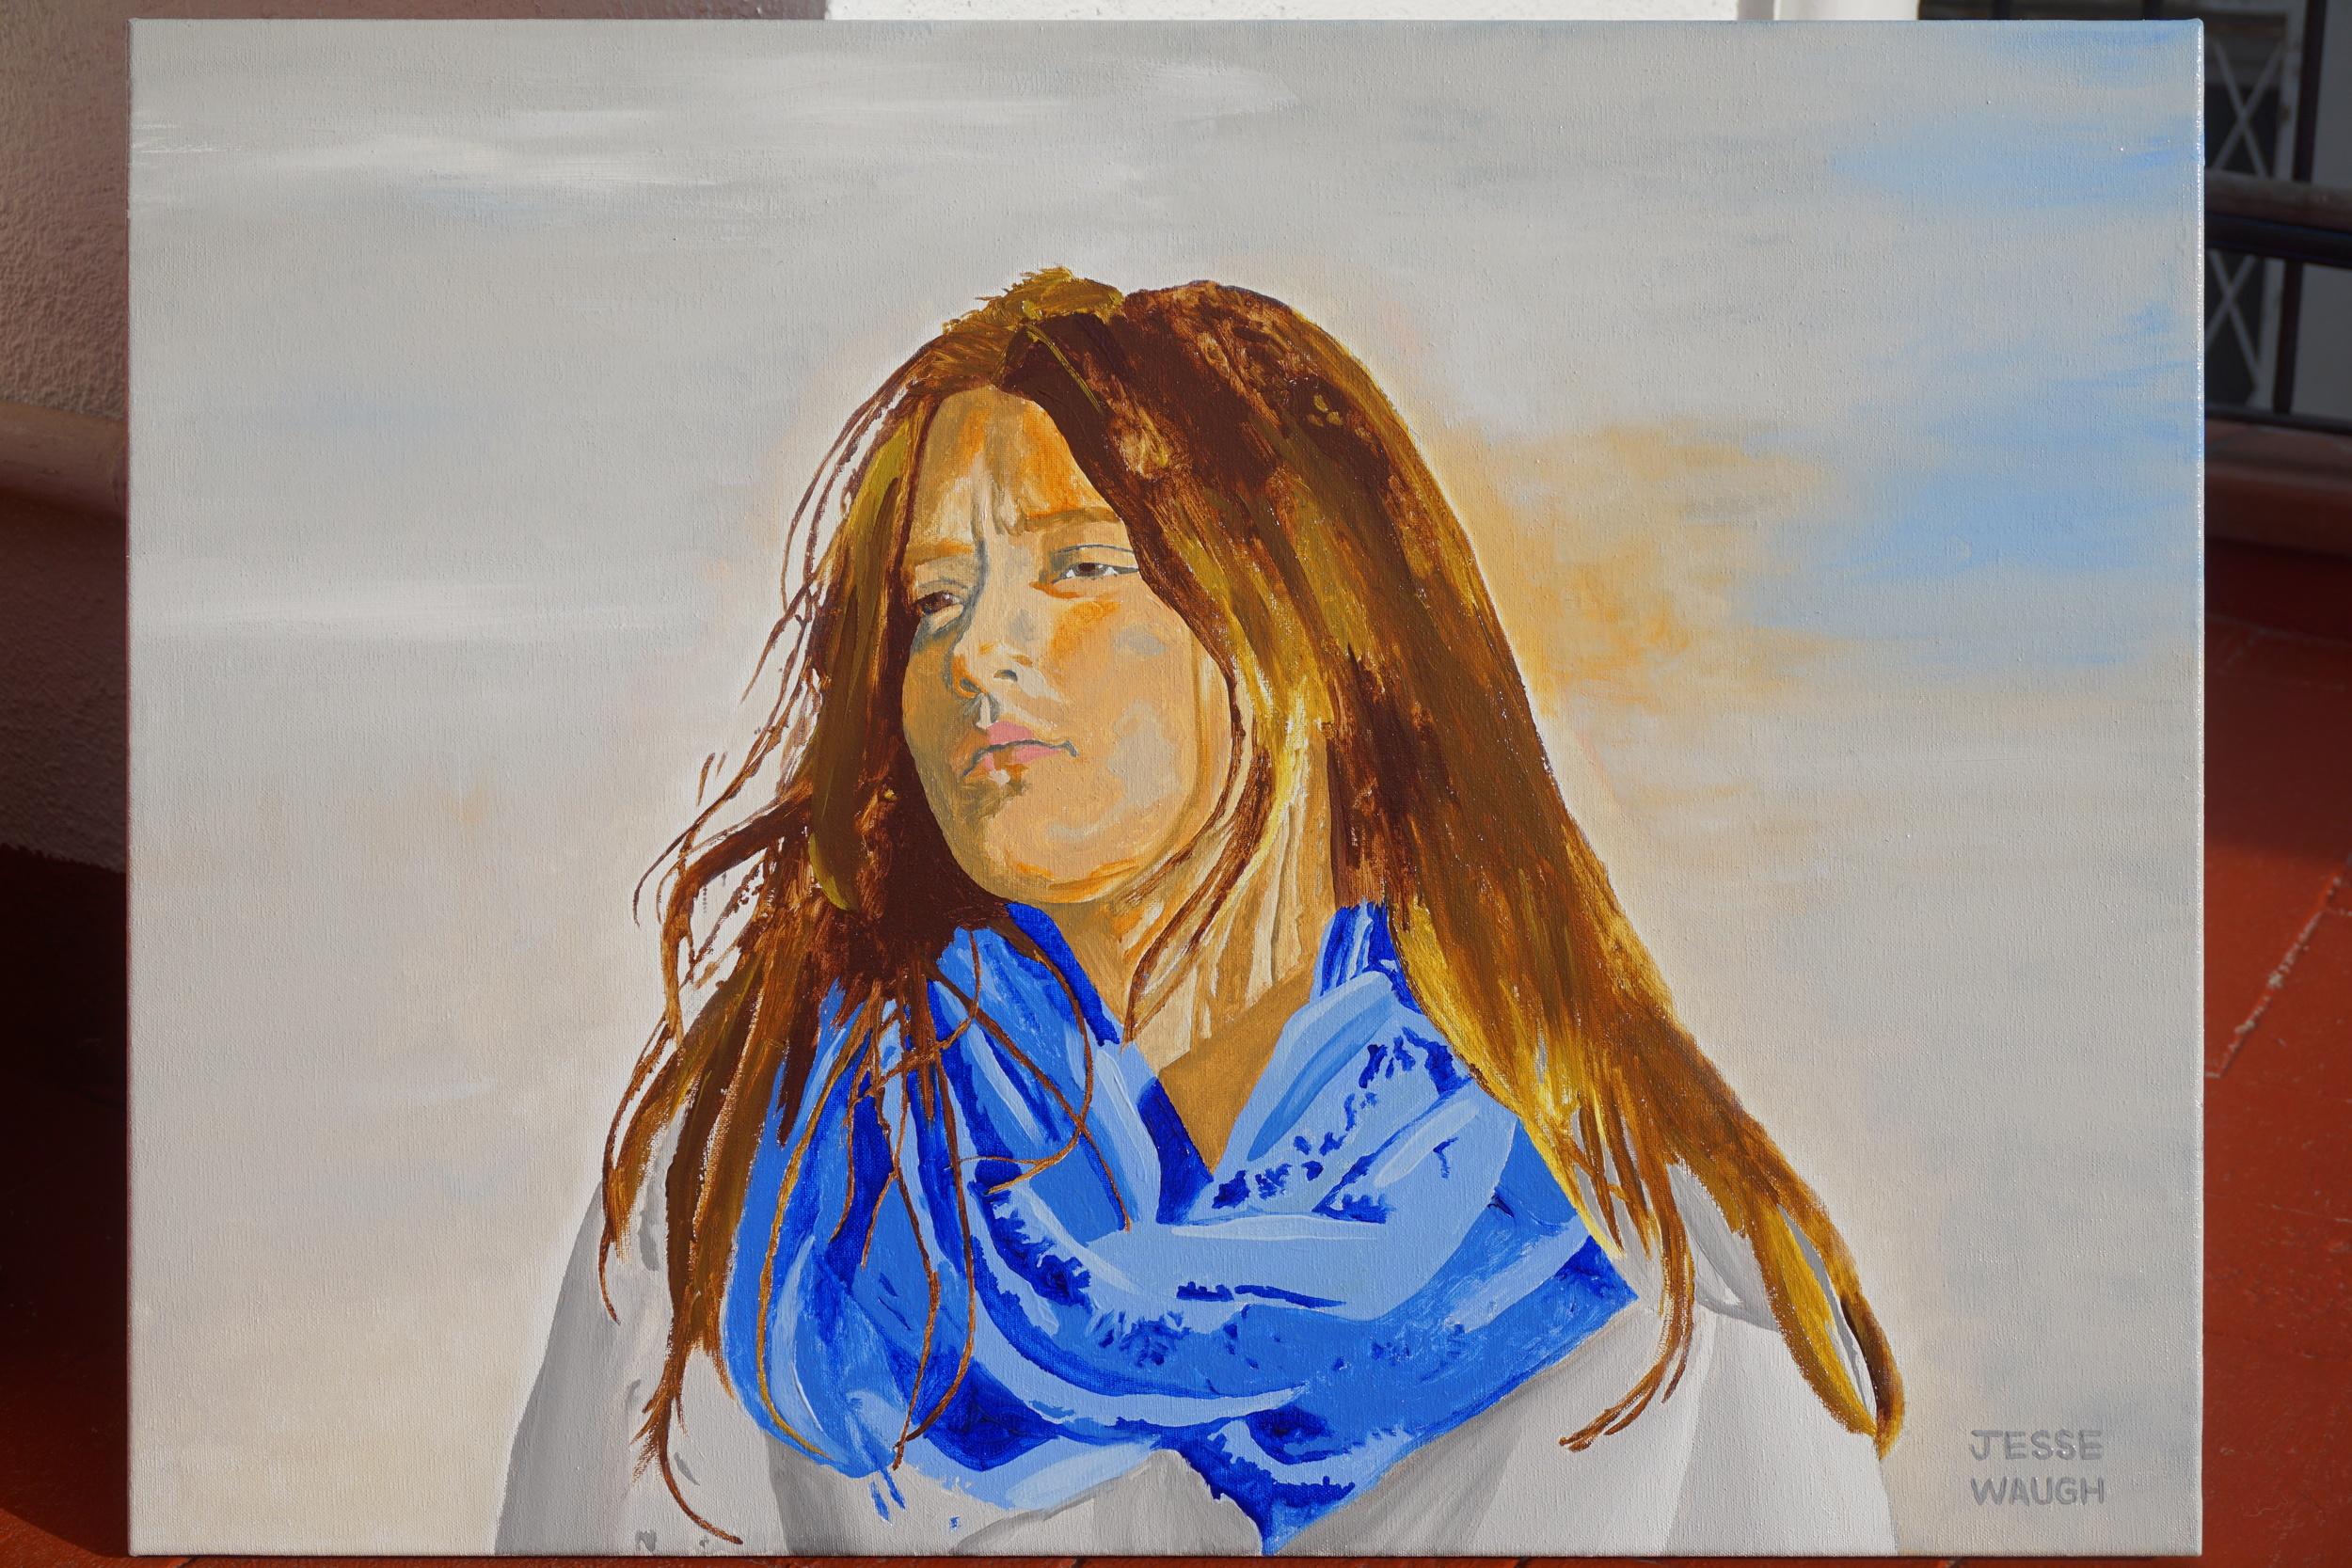 2015-12-15-Lextasi-JESSE-WAUGH-jessewaugh.com-ORIGINAL-SUN.JPG